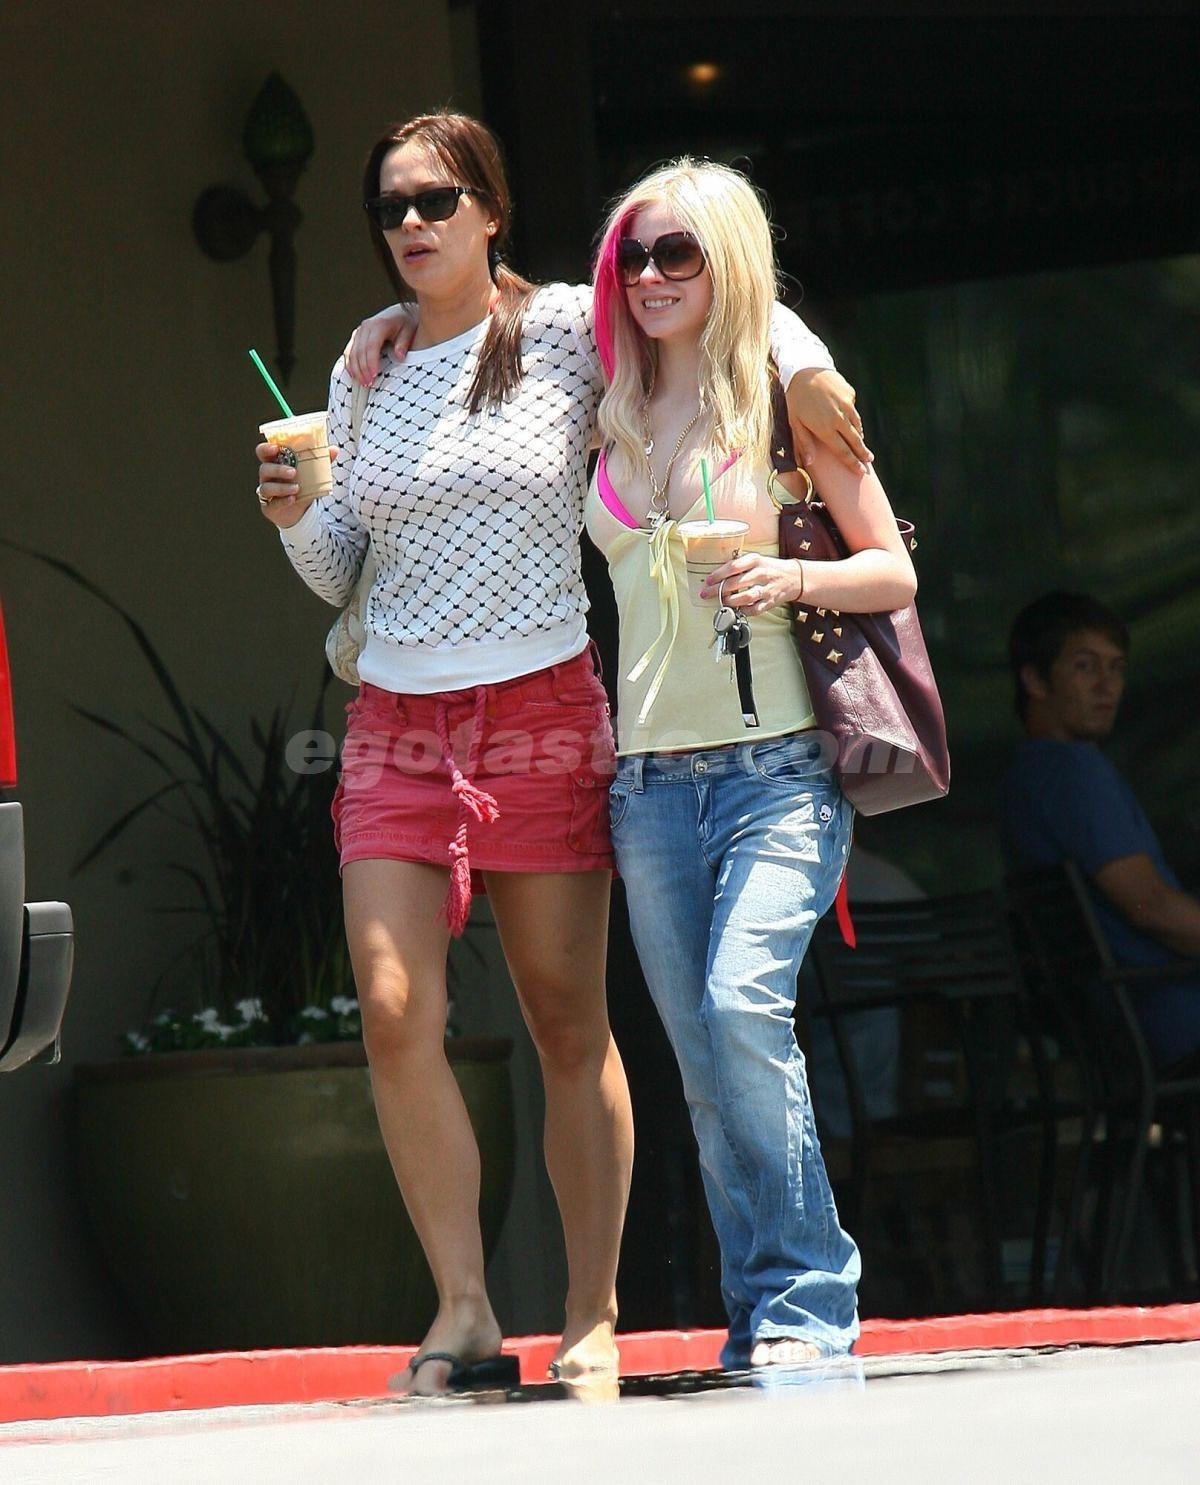 http://3.bp.blogspot.com/_pN1NKUA2EaM/TRx1Zvbb4cI/AAAAAAAAAUo/nx0OGKGBX1o/s1600/orig_avril_lavigne_bikini_1_pink_06.jpg